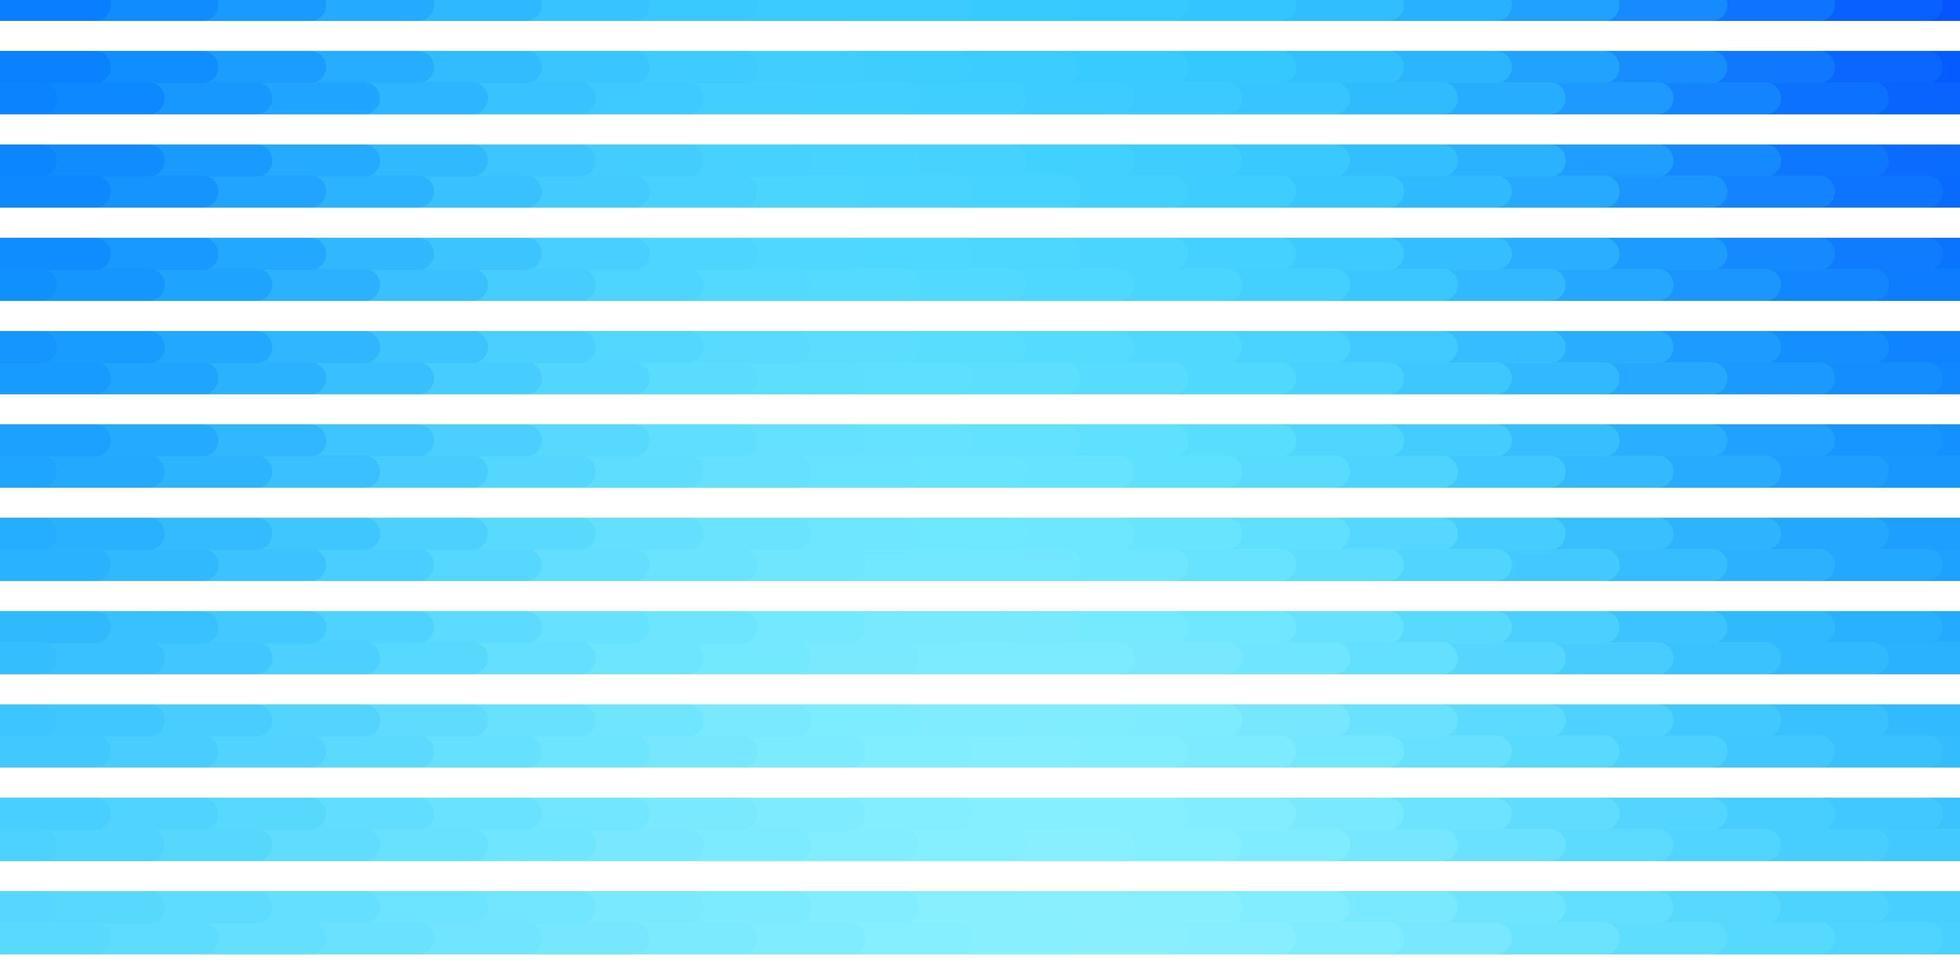 hellblaue Vektorschablone mit Linien. vektor